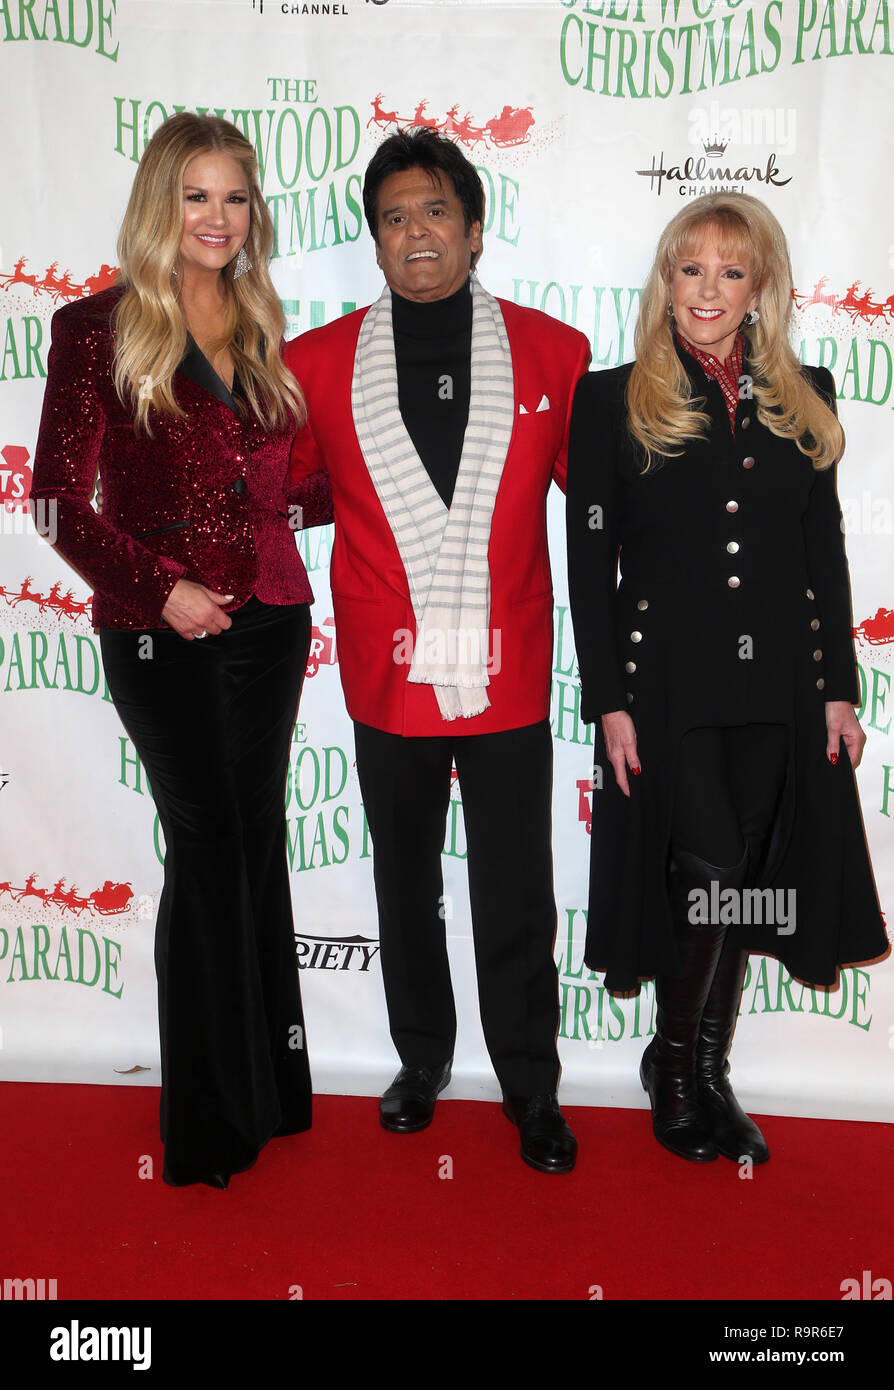 The Christmas Parade Hallmark.87th Annual Hollywood Christmas Parade Featuring Nancy O